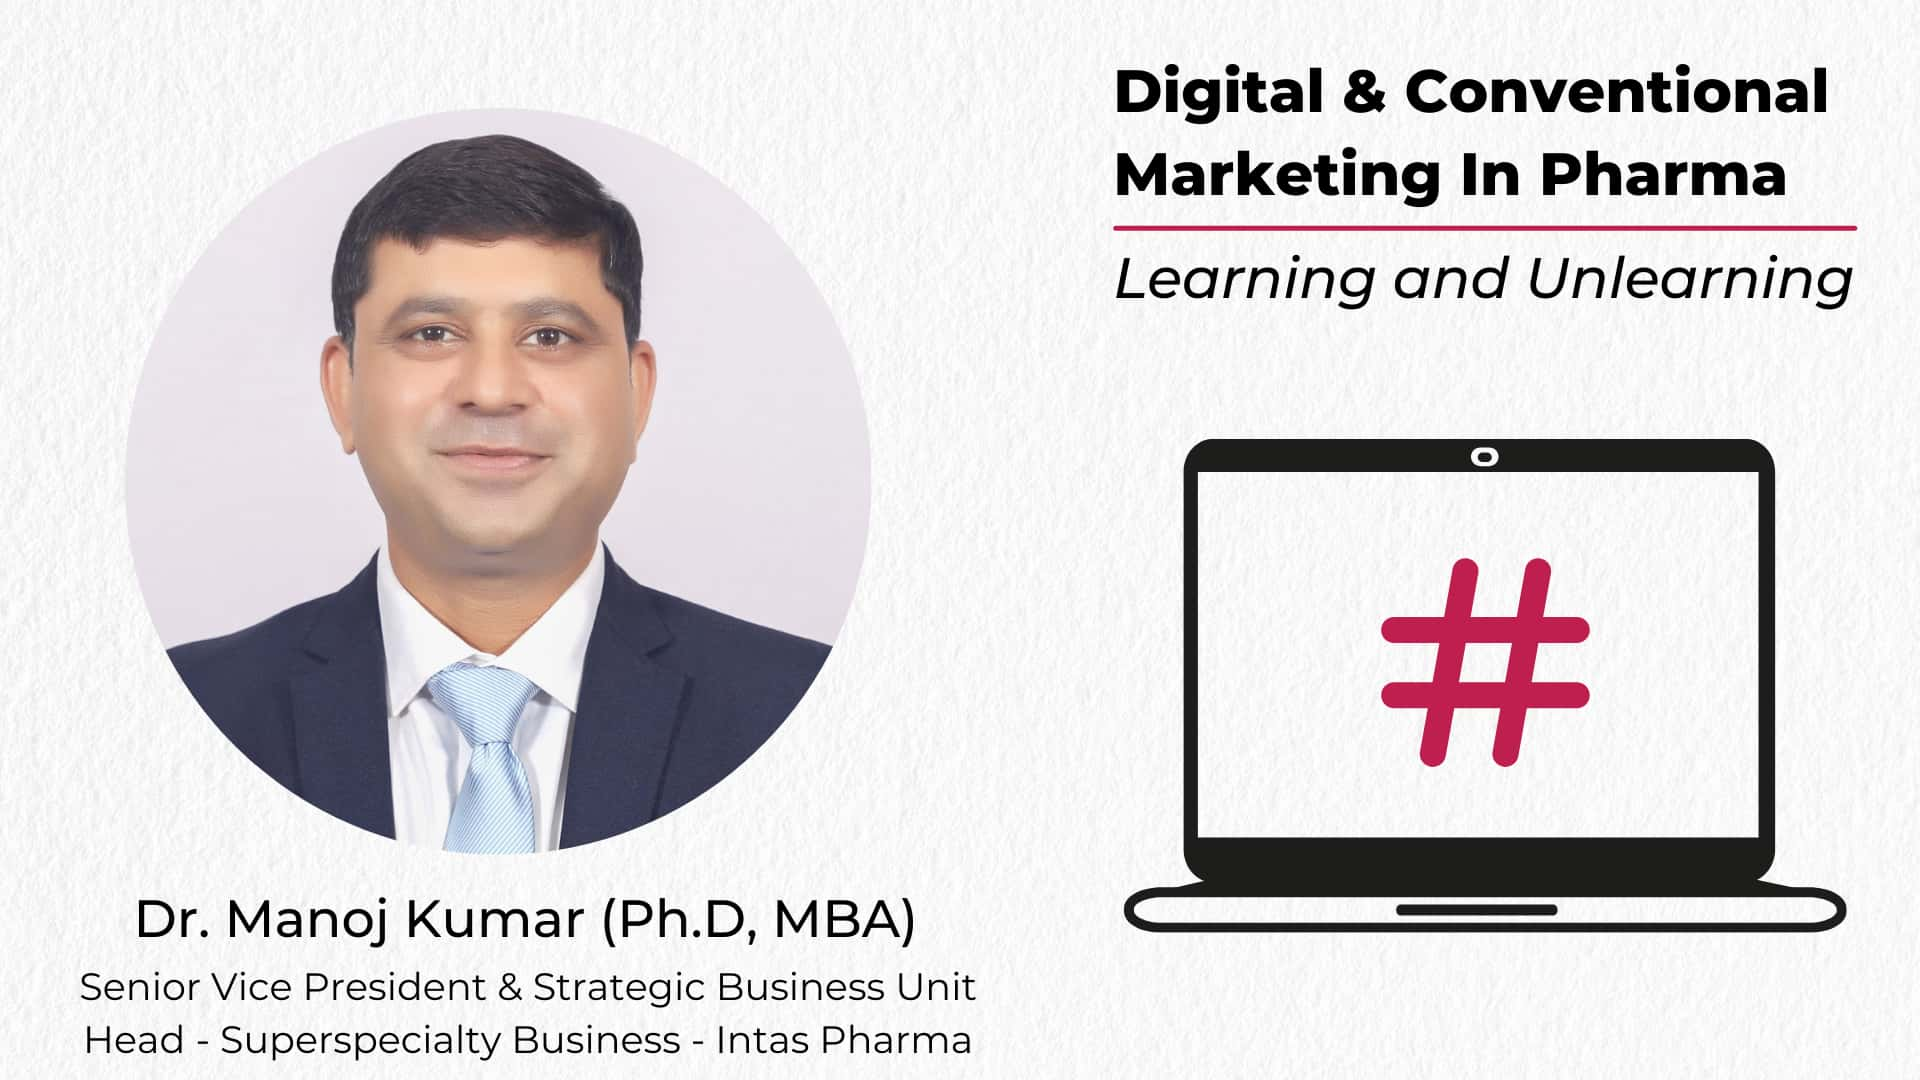 Digital & Conventional Marketing In Pharma